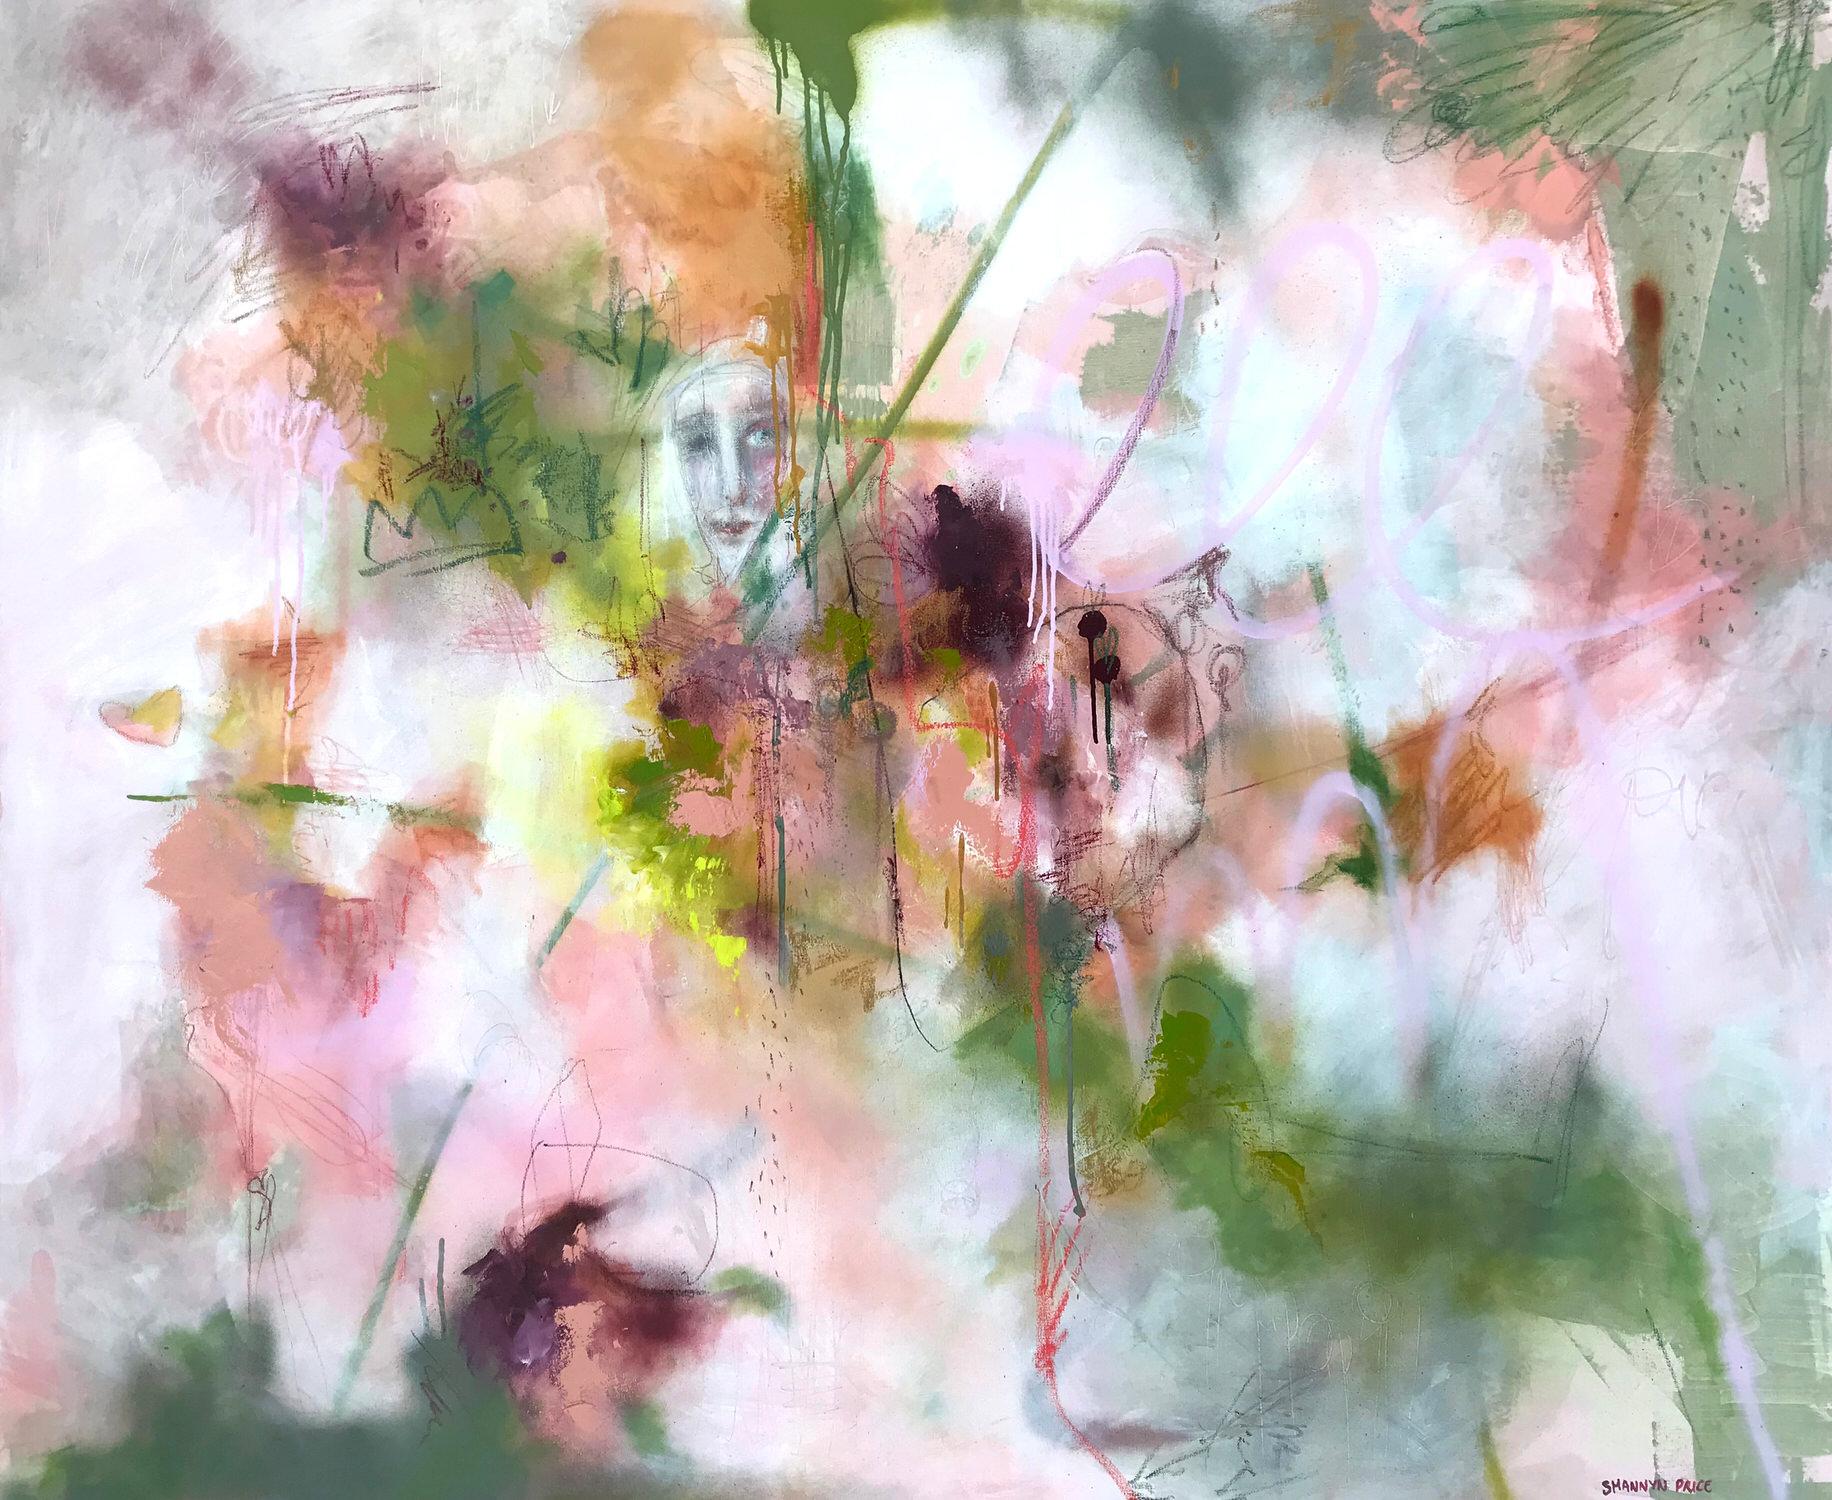 Shannyn Alexene PriceBlush, 2019 Mixed Media on Canvas 152 x 122 cm.jpg